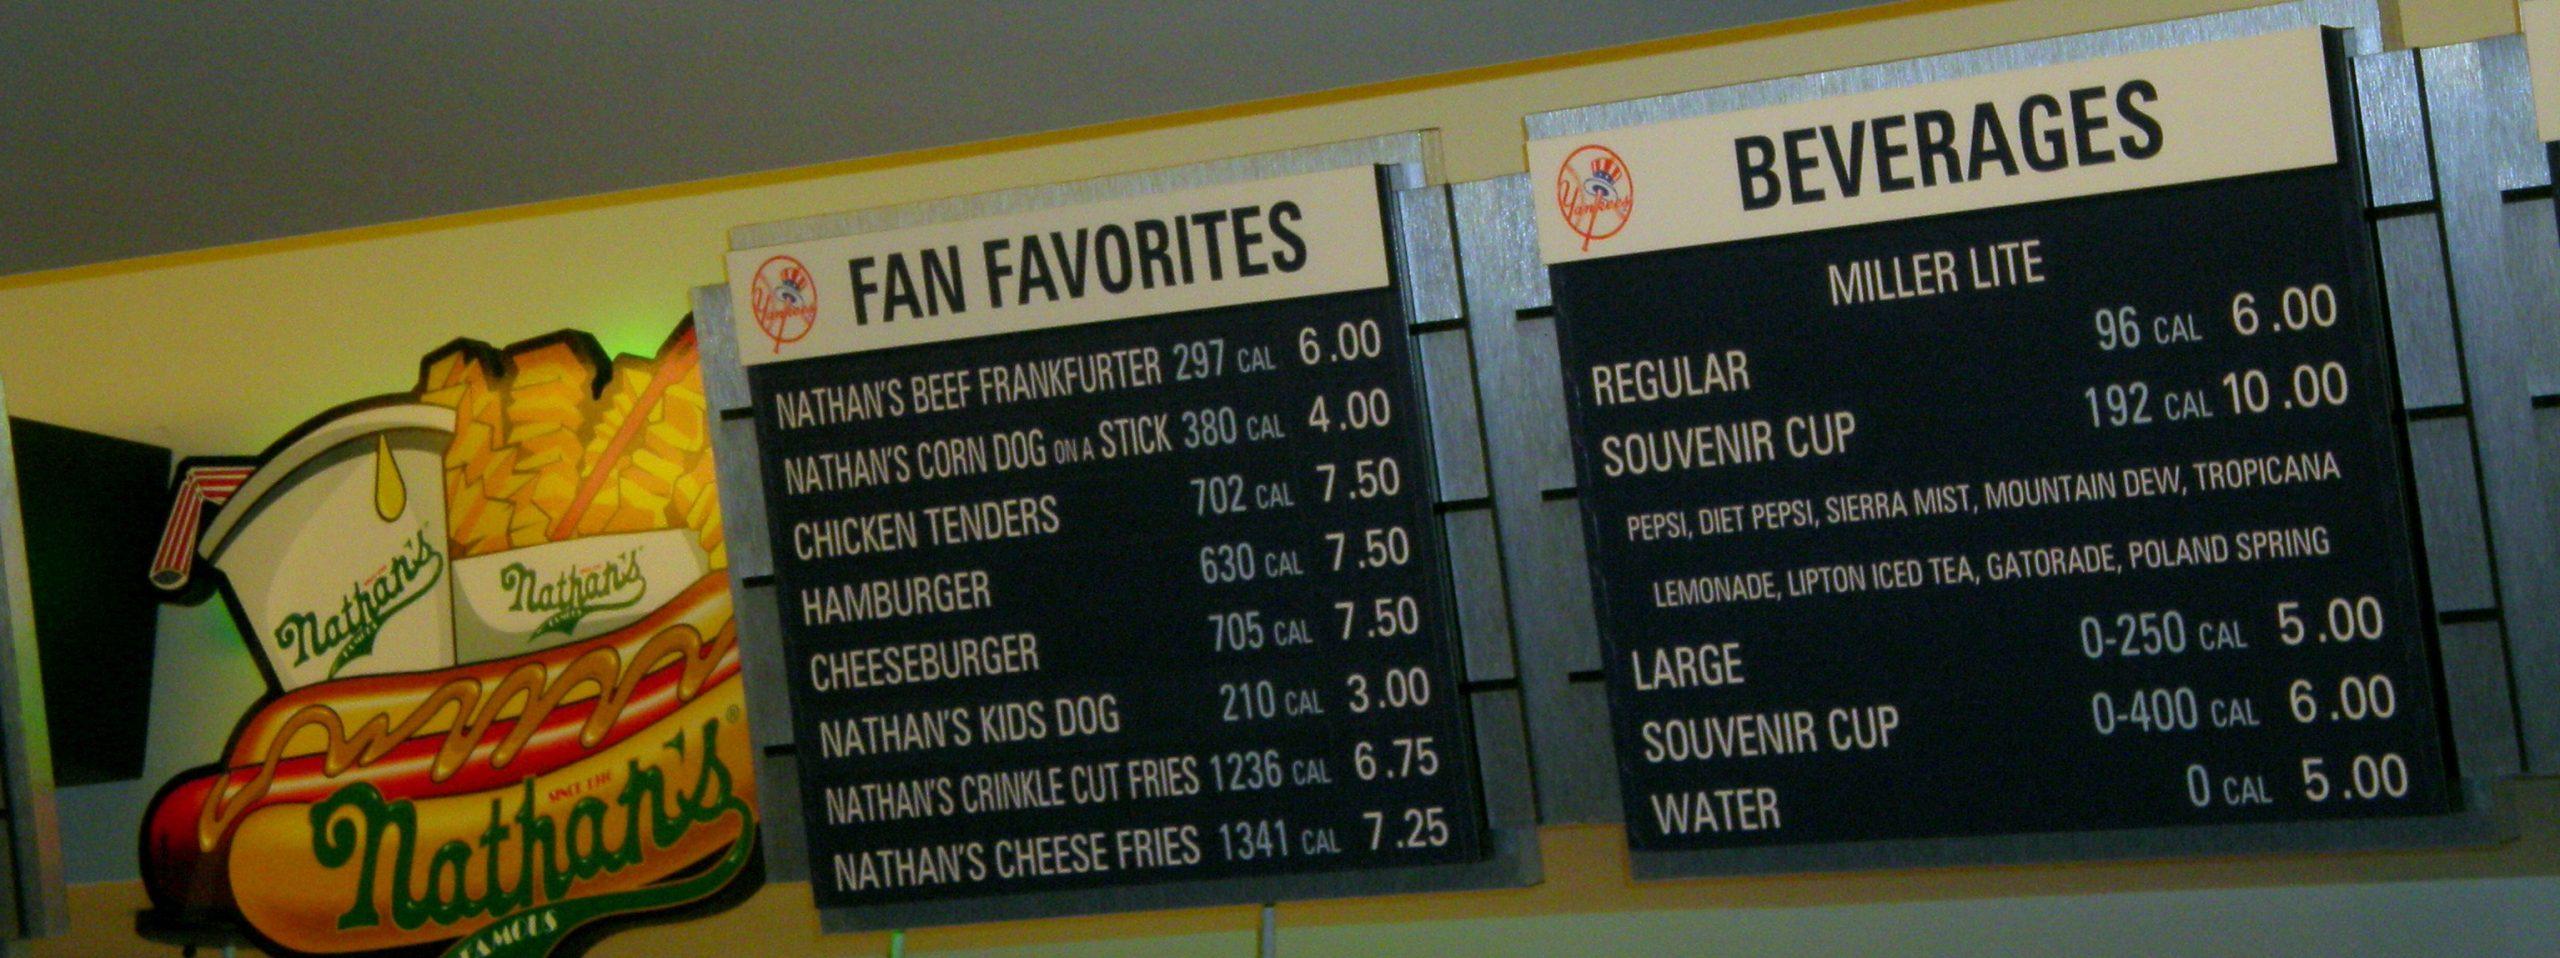 A menu sign at a Nathan's hotdog stand displays calorie countrs